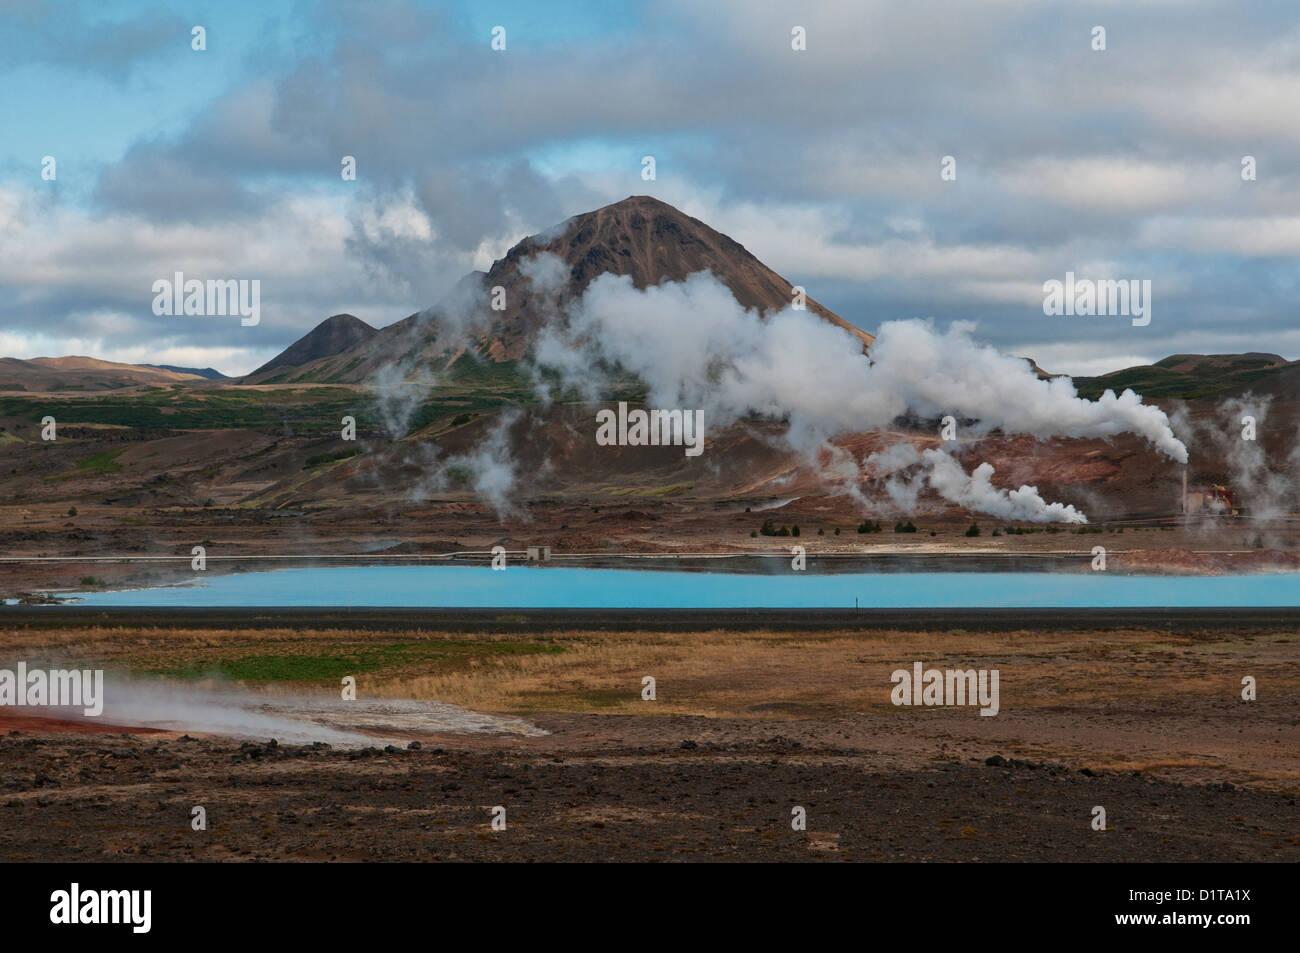 geothermal power and volcanic landscape near Lake Myvatn, Iceland - Stock Image